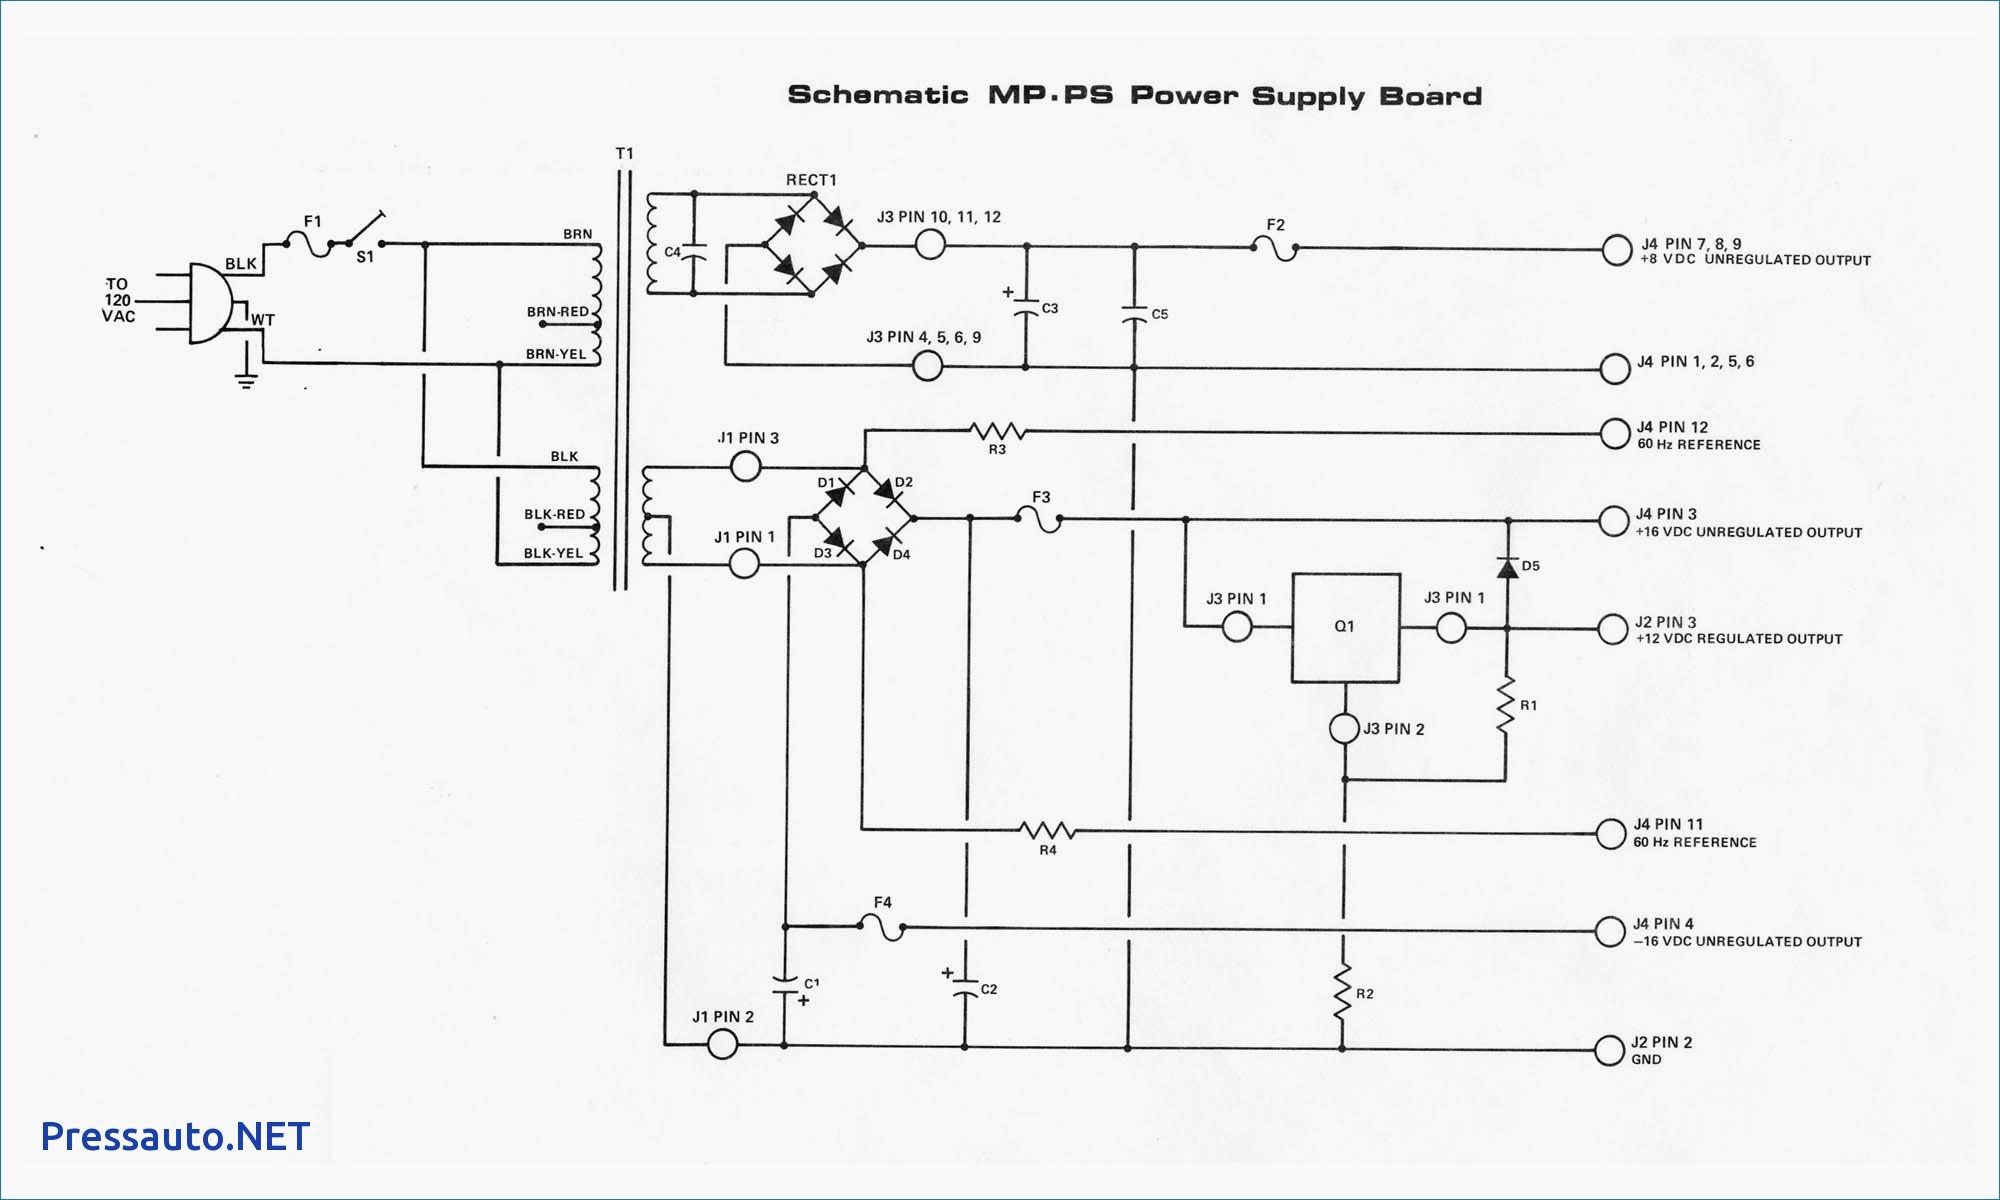 atx power supply schematic diagram on xbox 360 power supply diagrams Xbox Wiring Diagrams